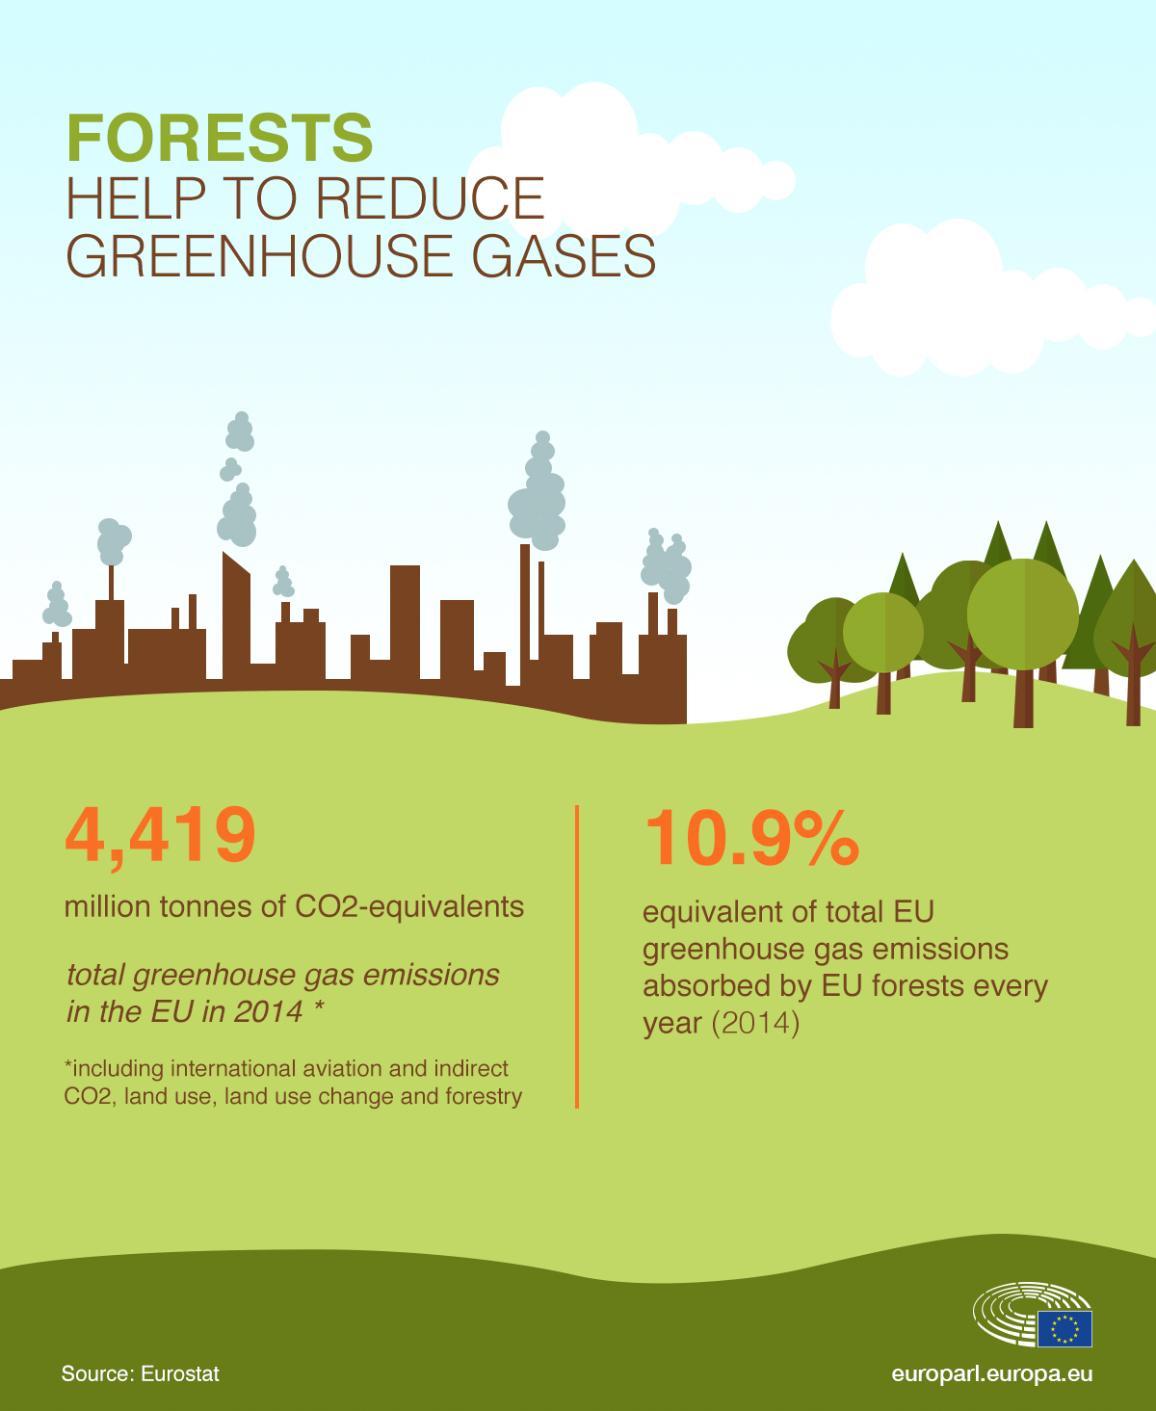 Infographic σχετικά με τις επιπτώσεις της αποψίλωσης των δασών